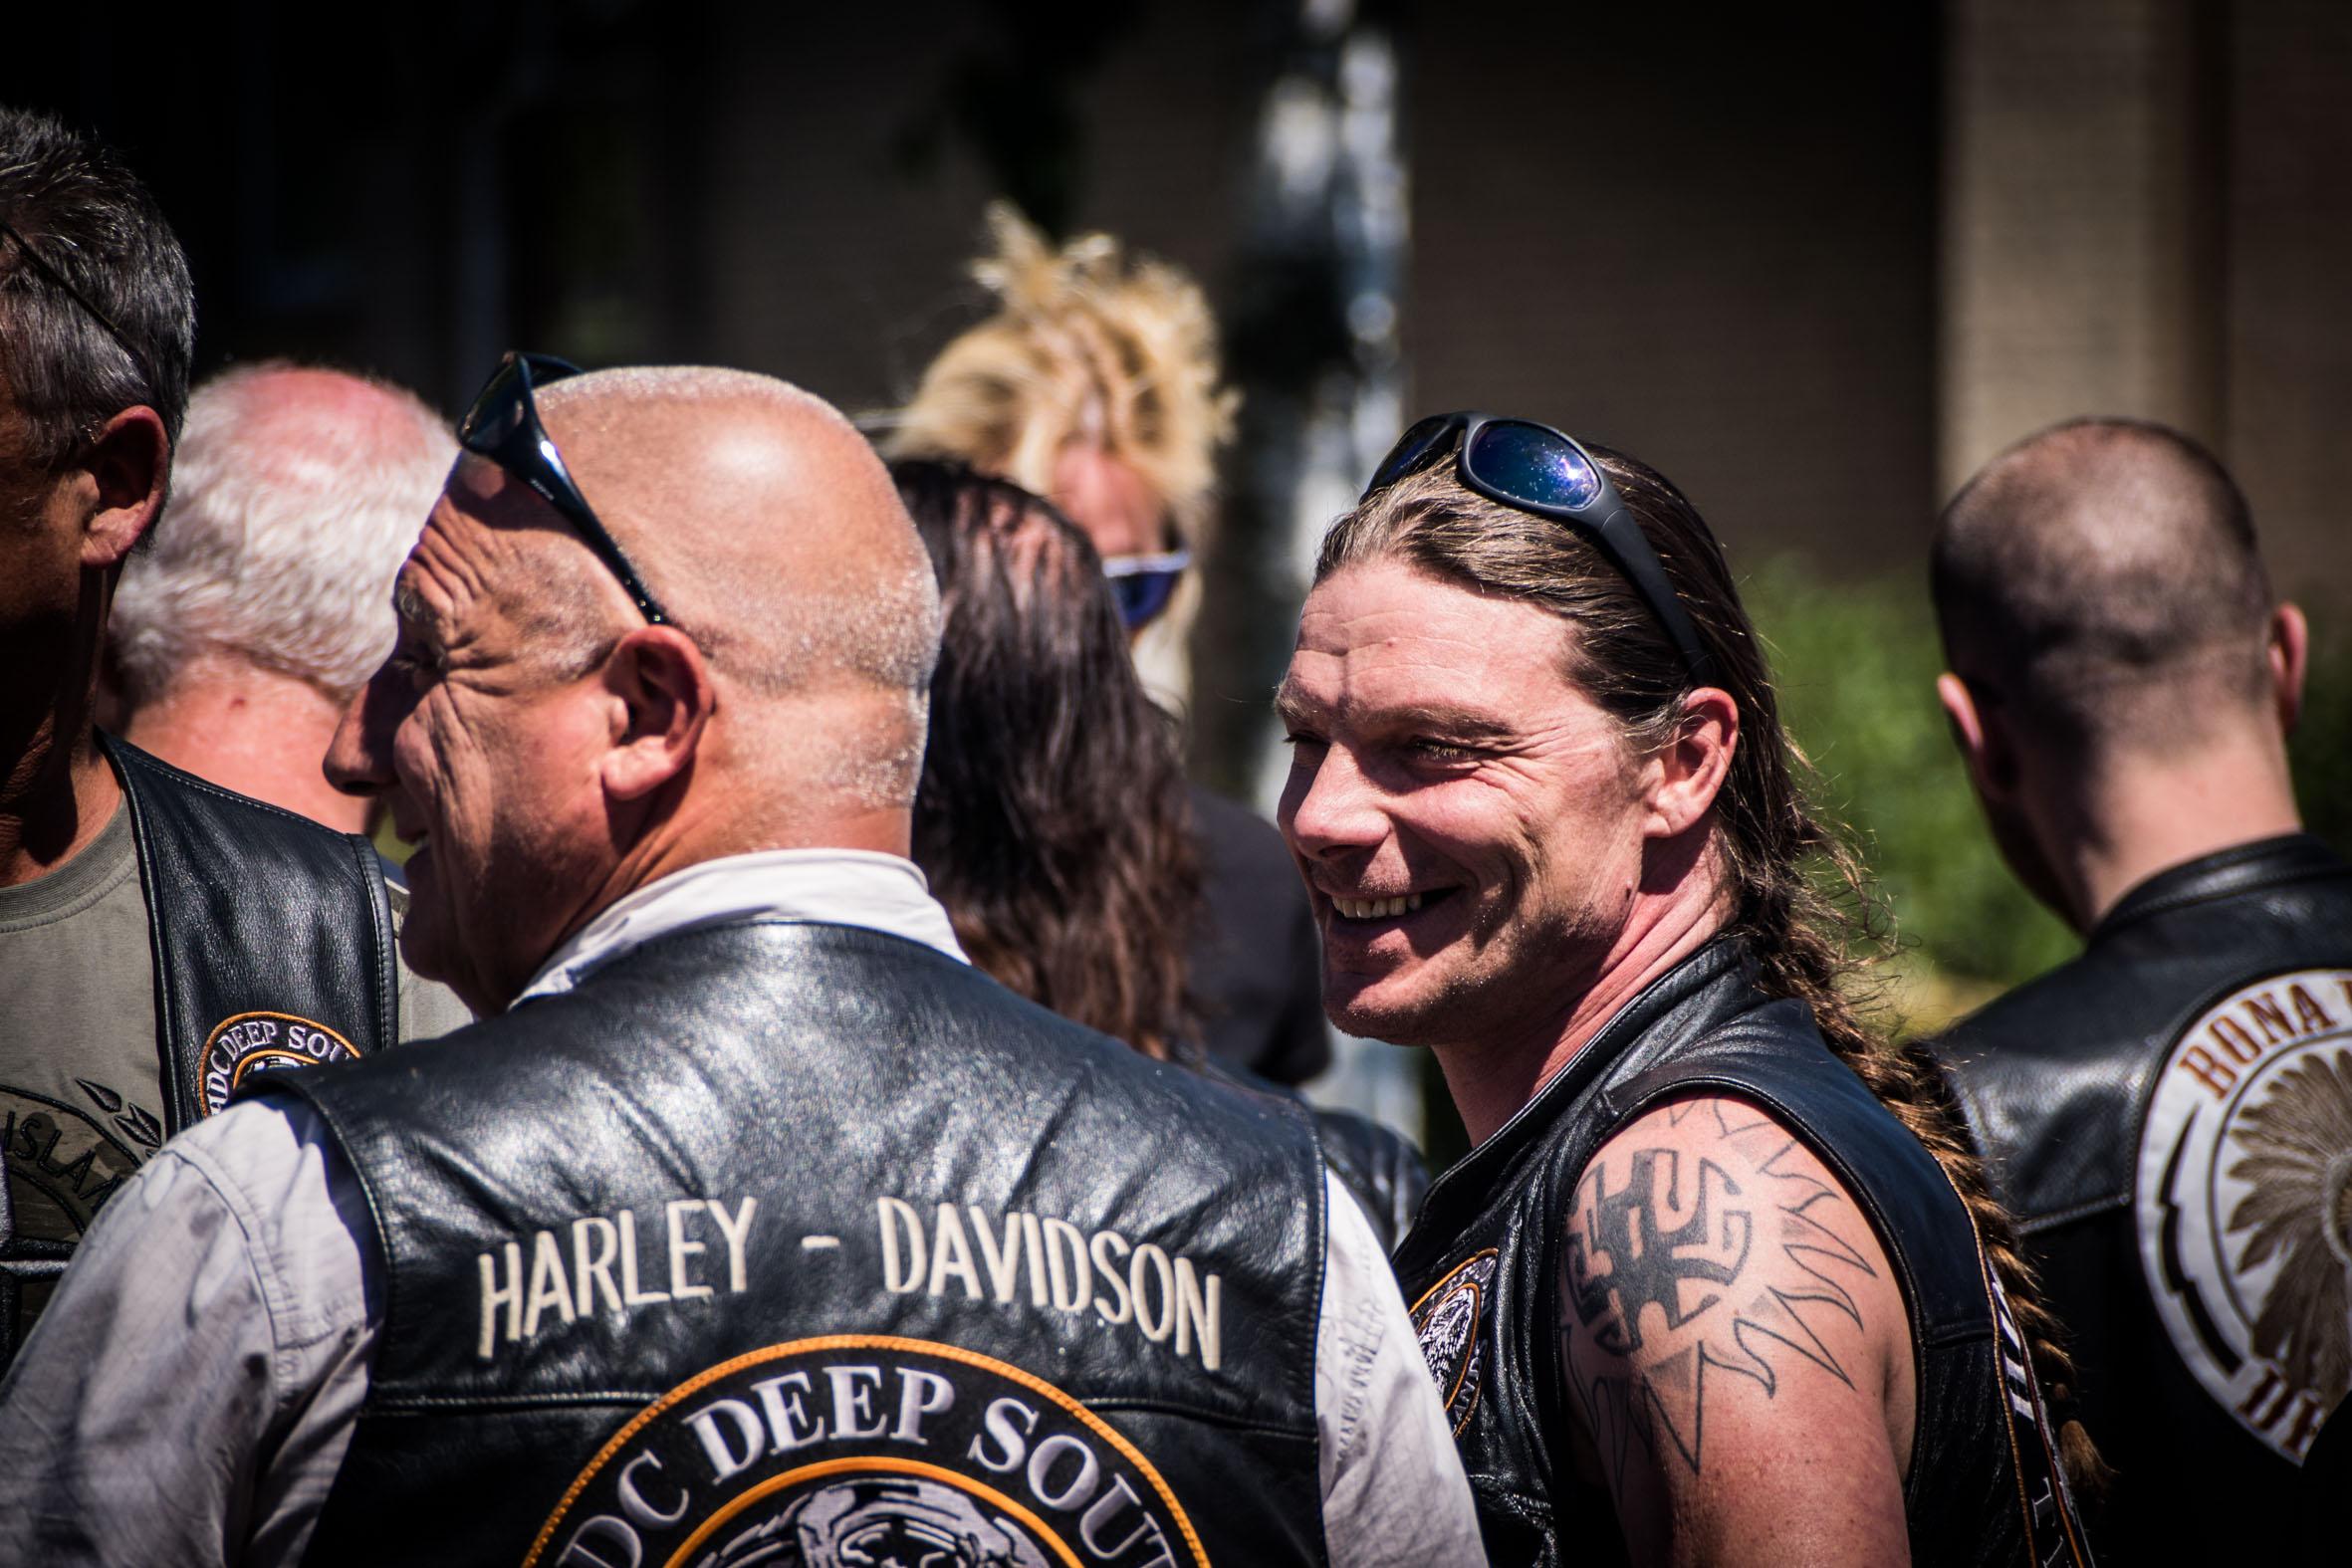 180701 Harley Davidson small-09316